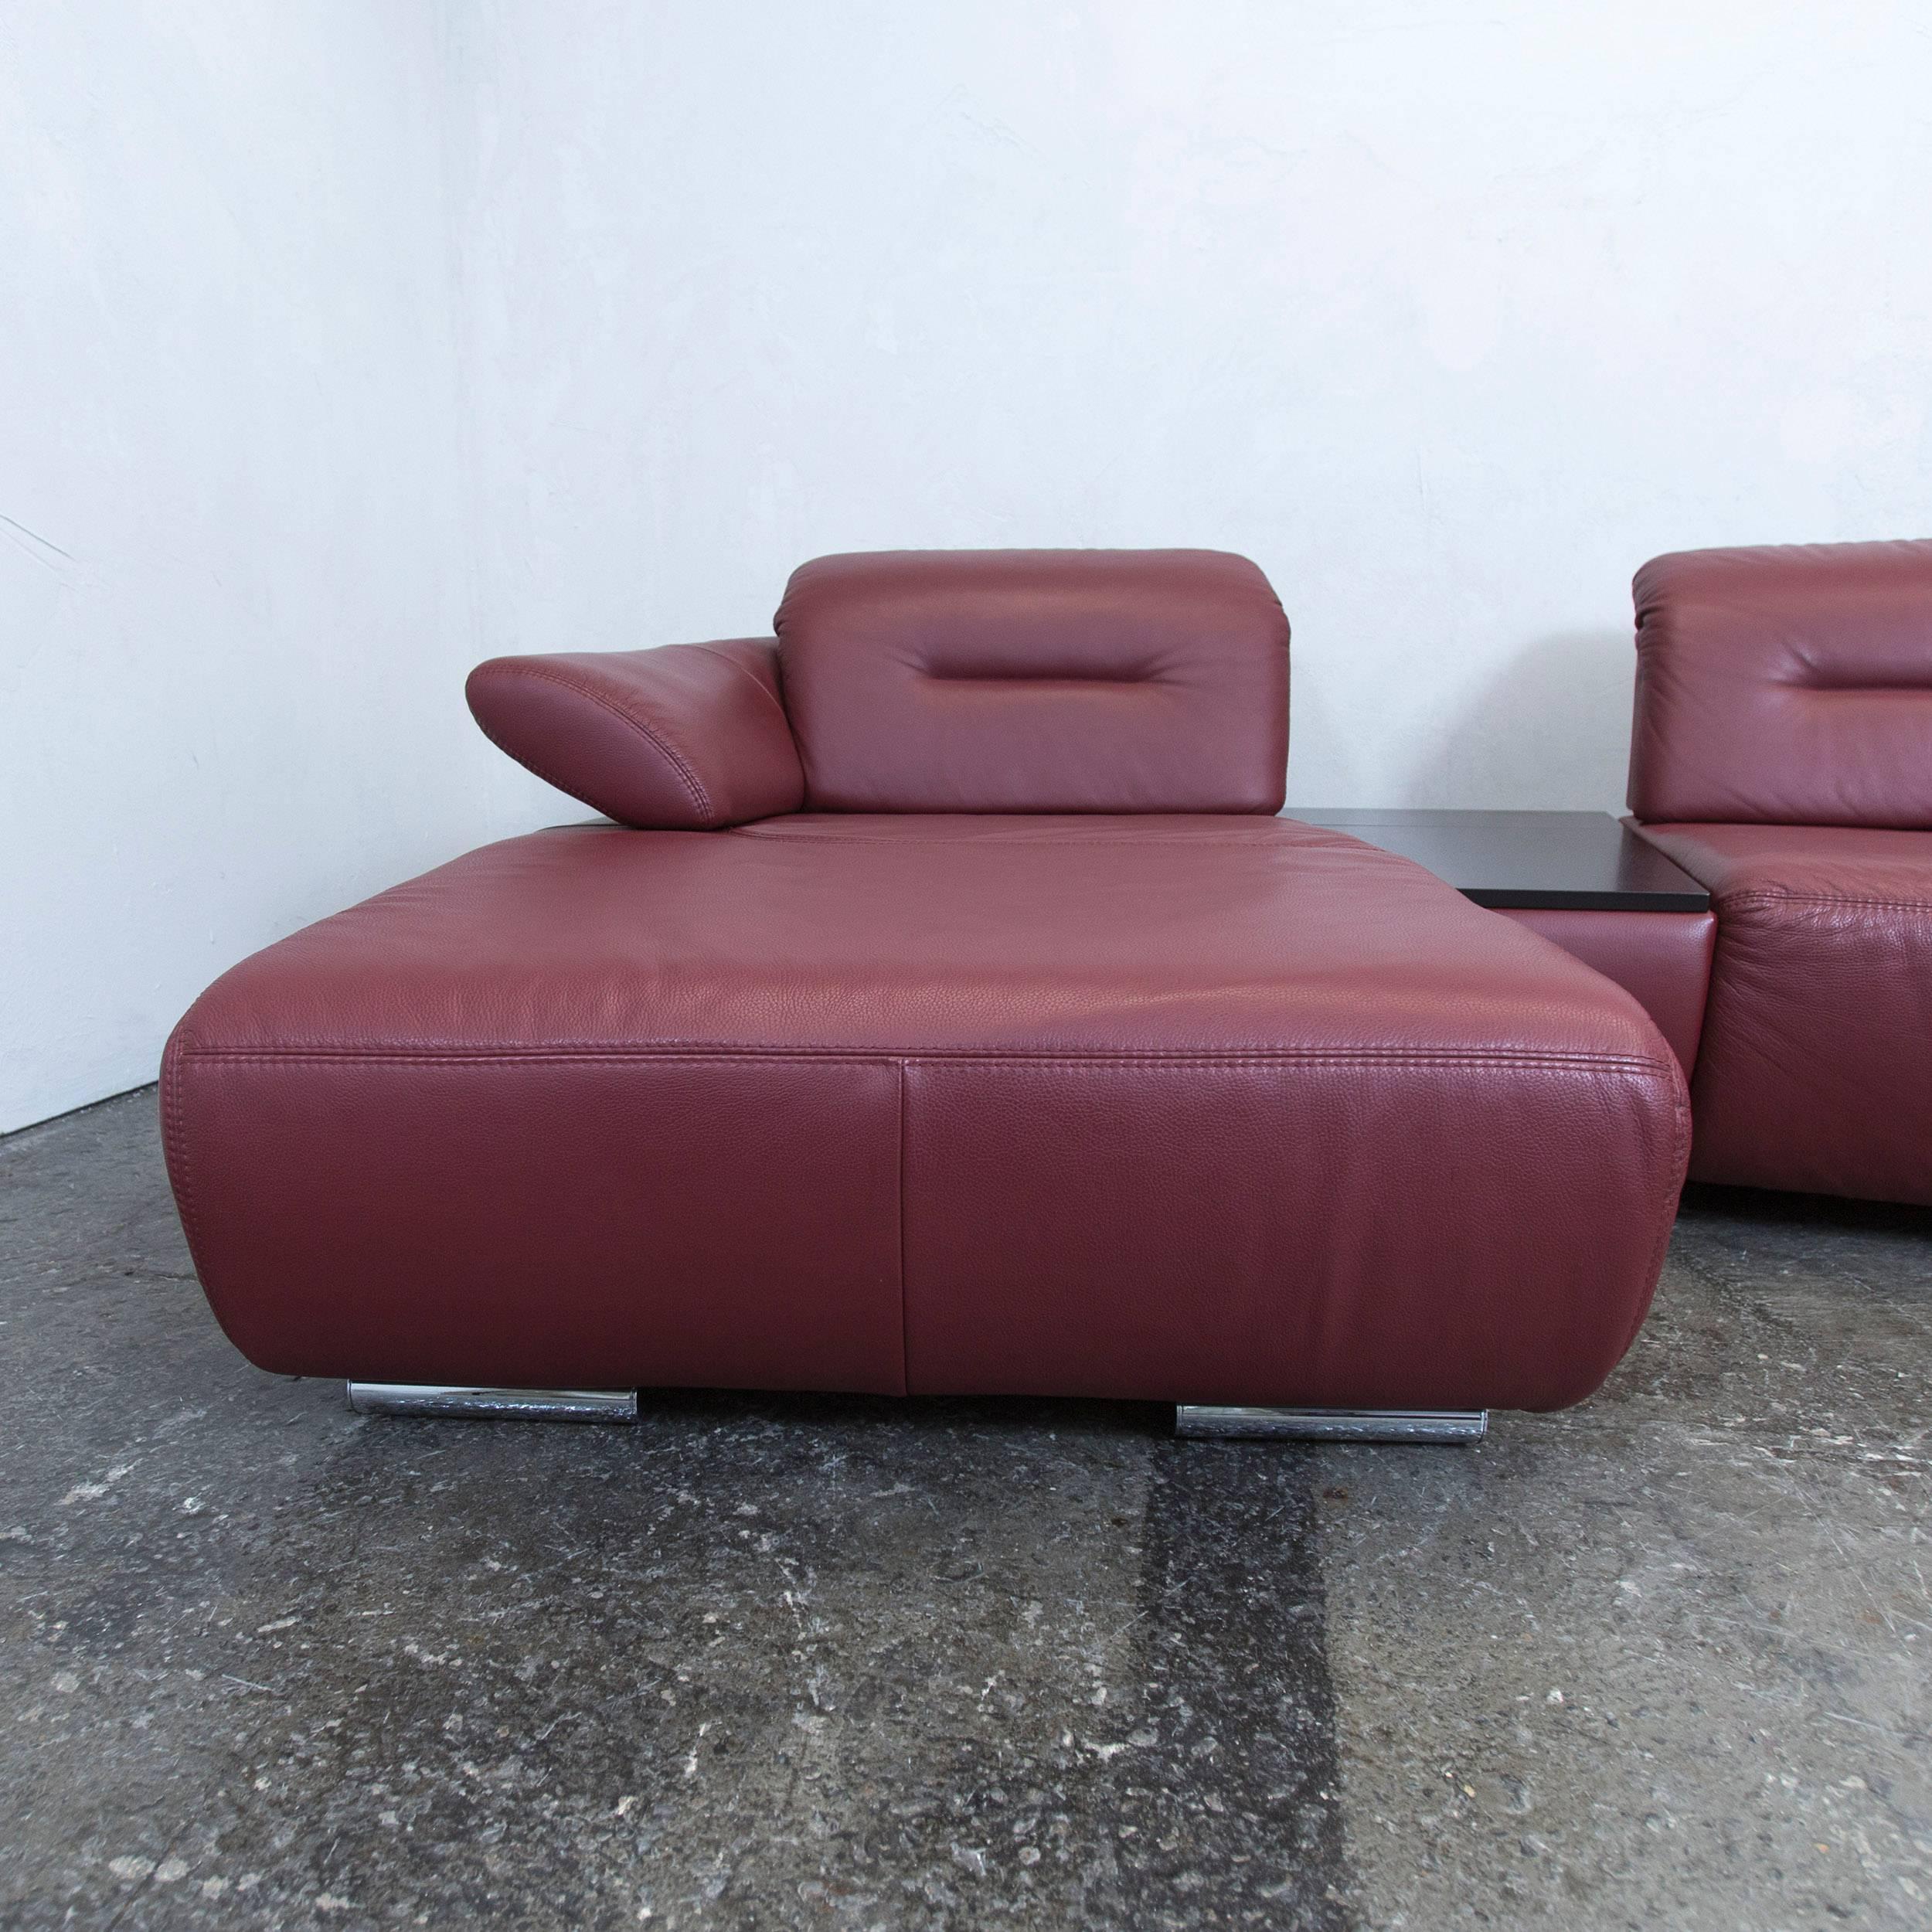 Recamiere Modern recamiere ottomane awesome recamiere ottomane liege sofa sofaliege